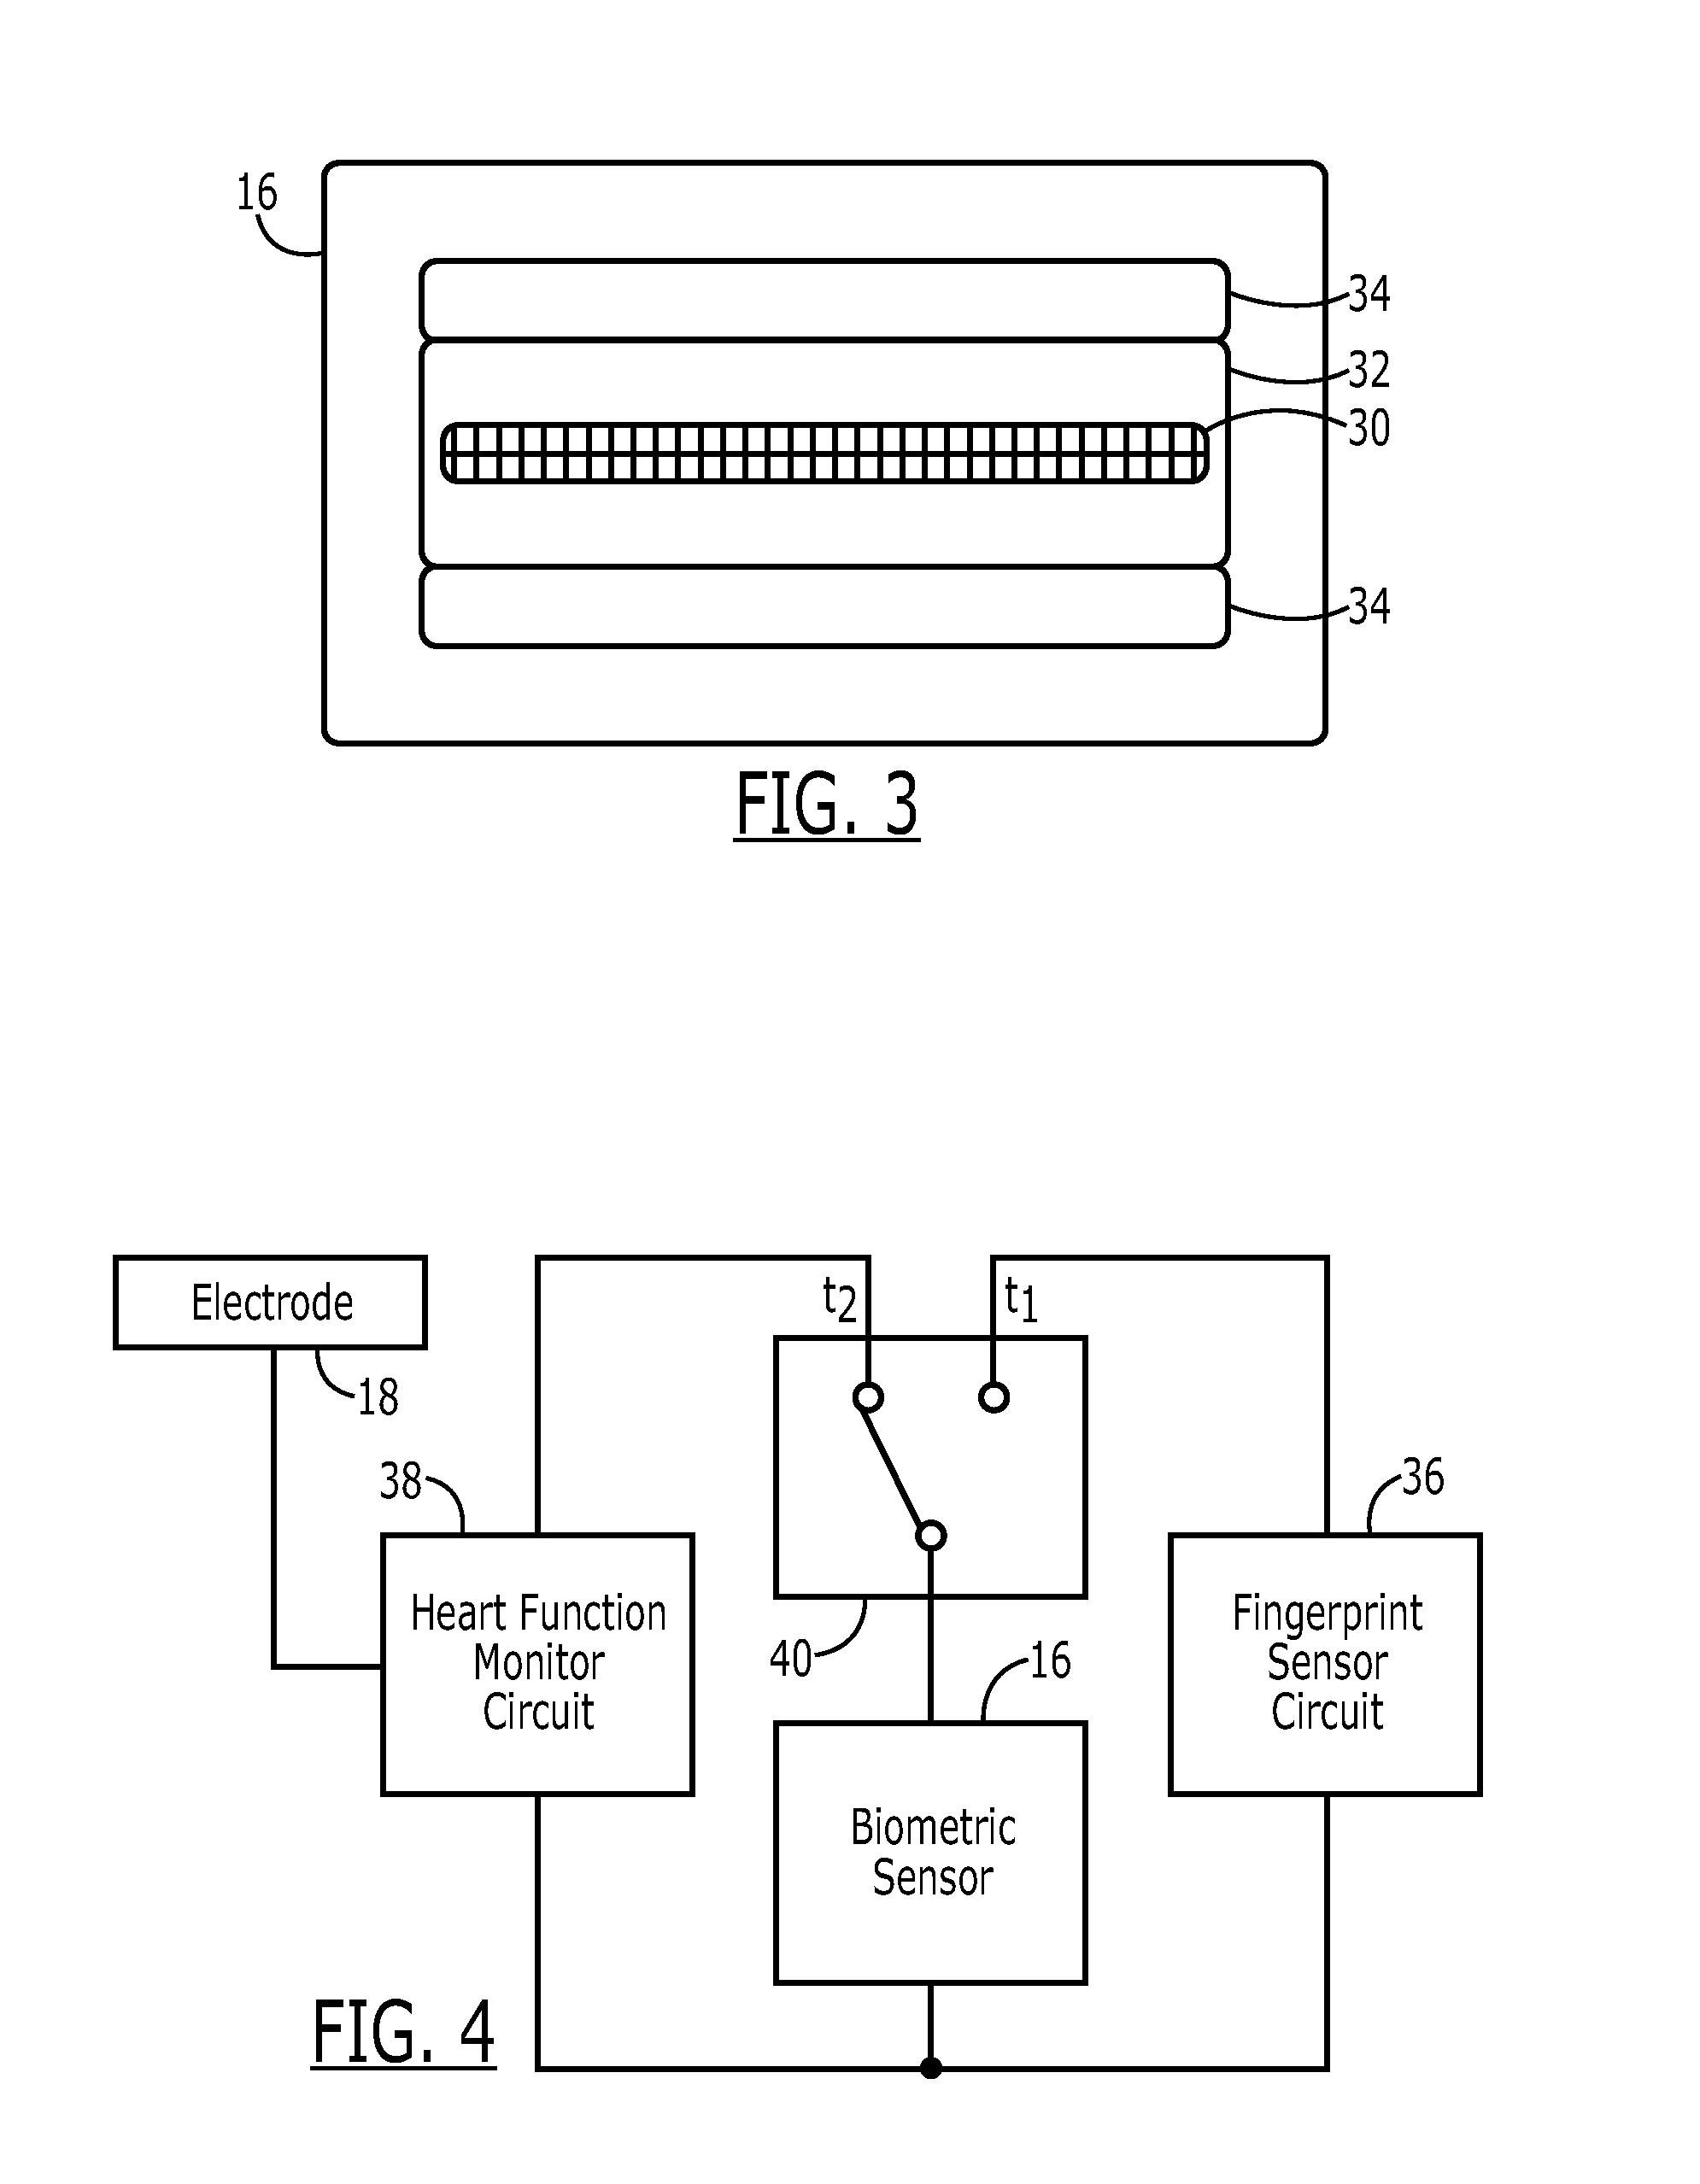 Us20110257546 Biometric Sensor And Heart Function Heartbeatmonitorcircuitjpg Patent Drawing